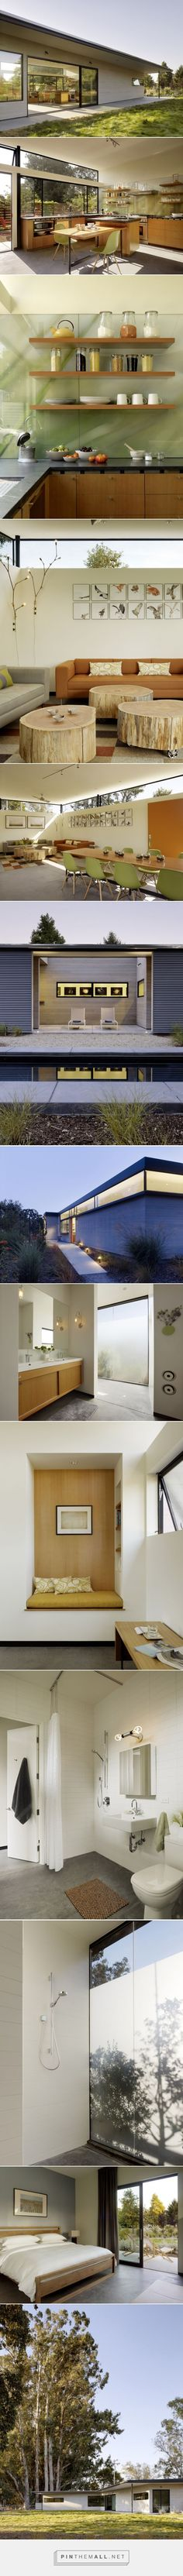 Casa barata com pinta de cara - Casa Vogue   Casas - created via https://pinthemall.net